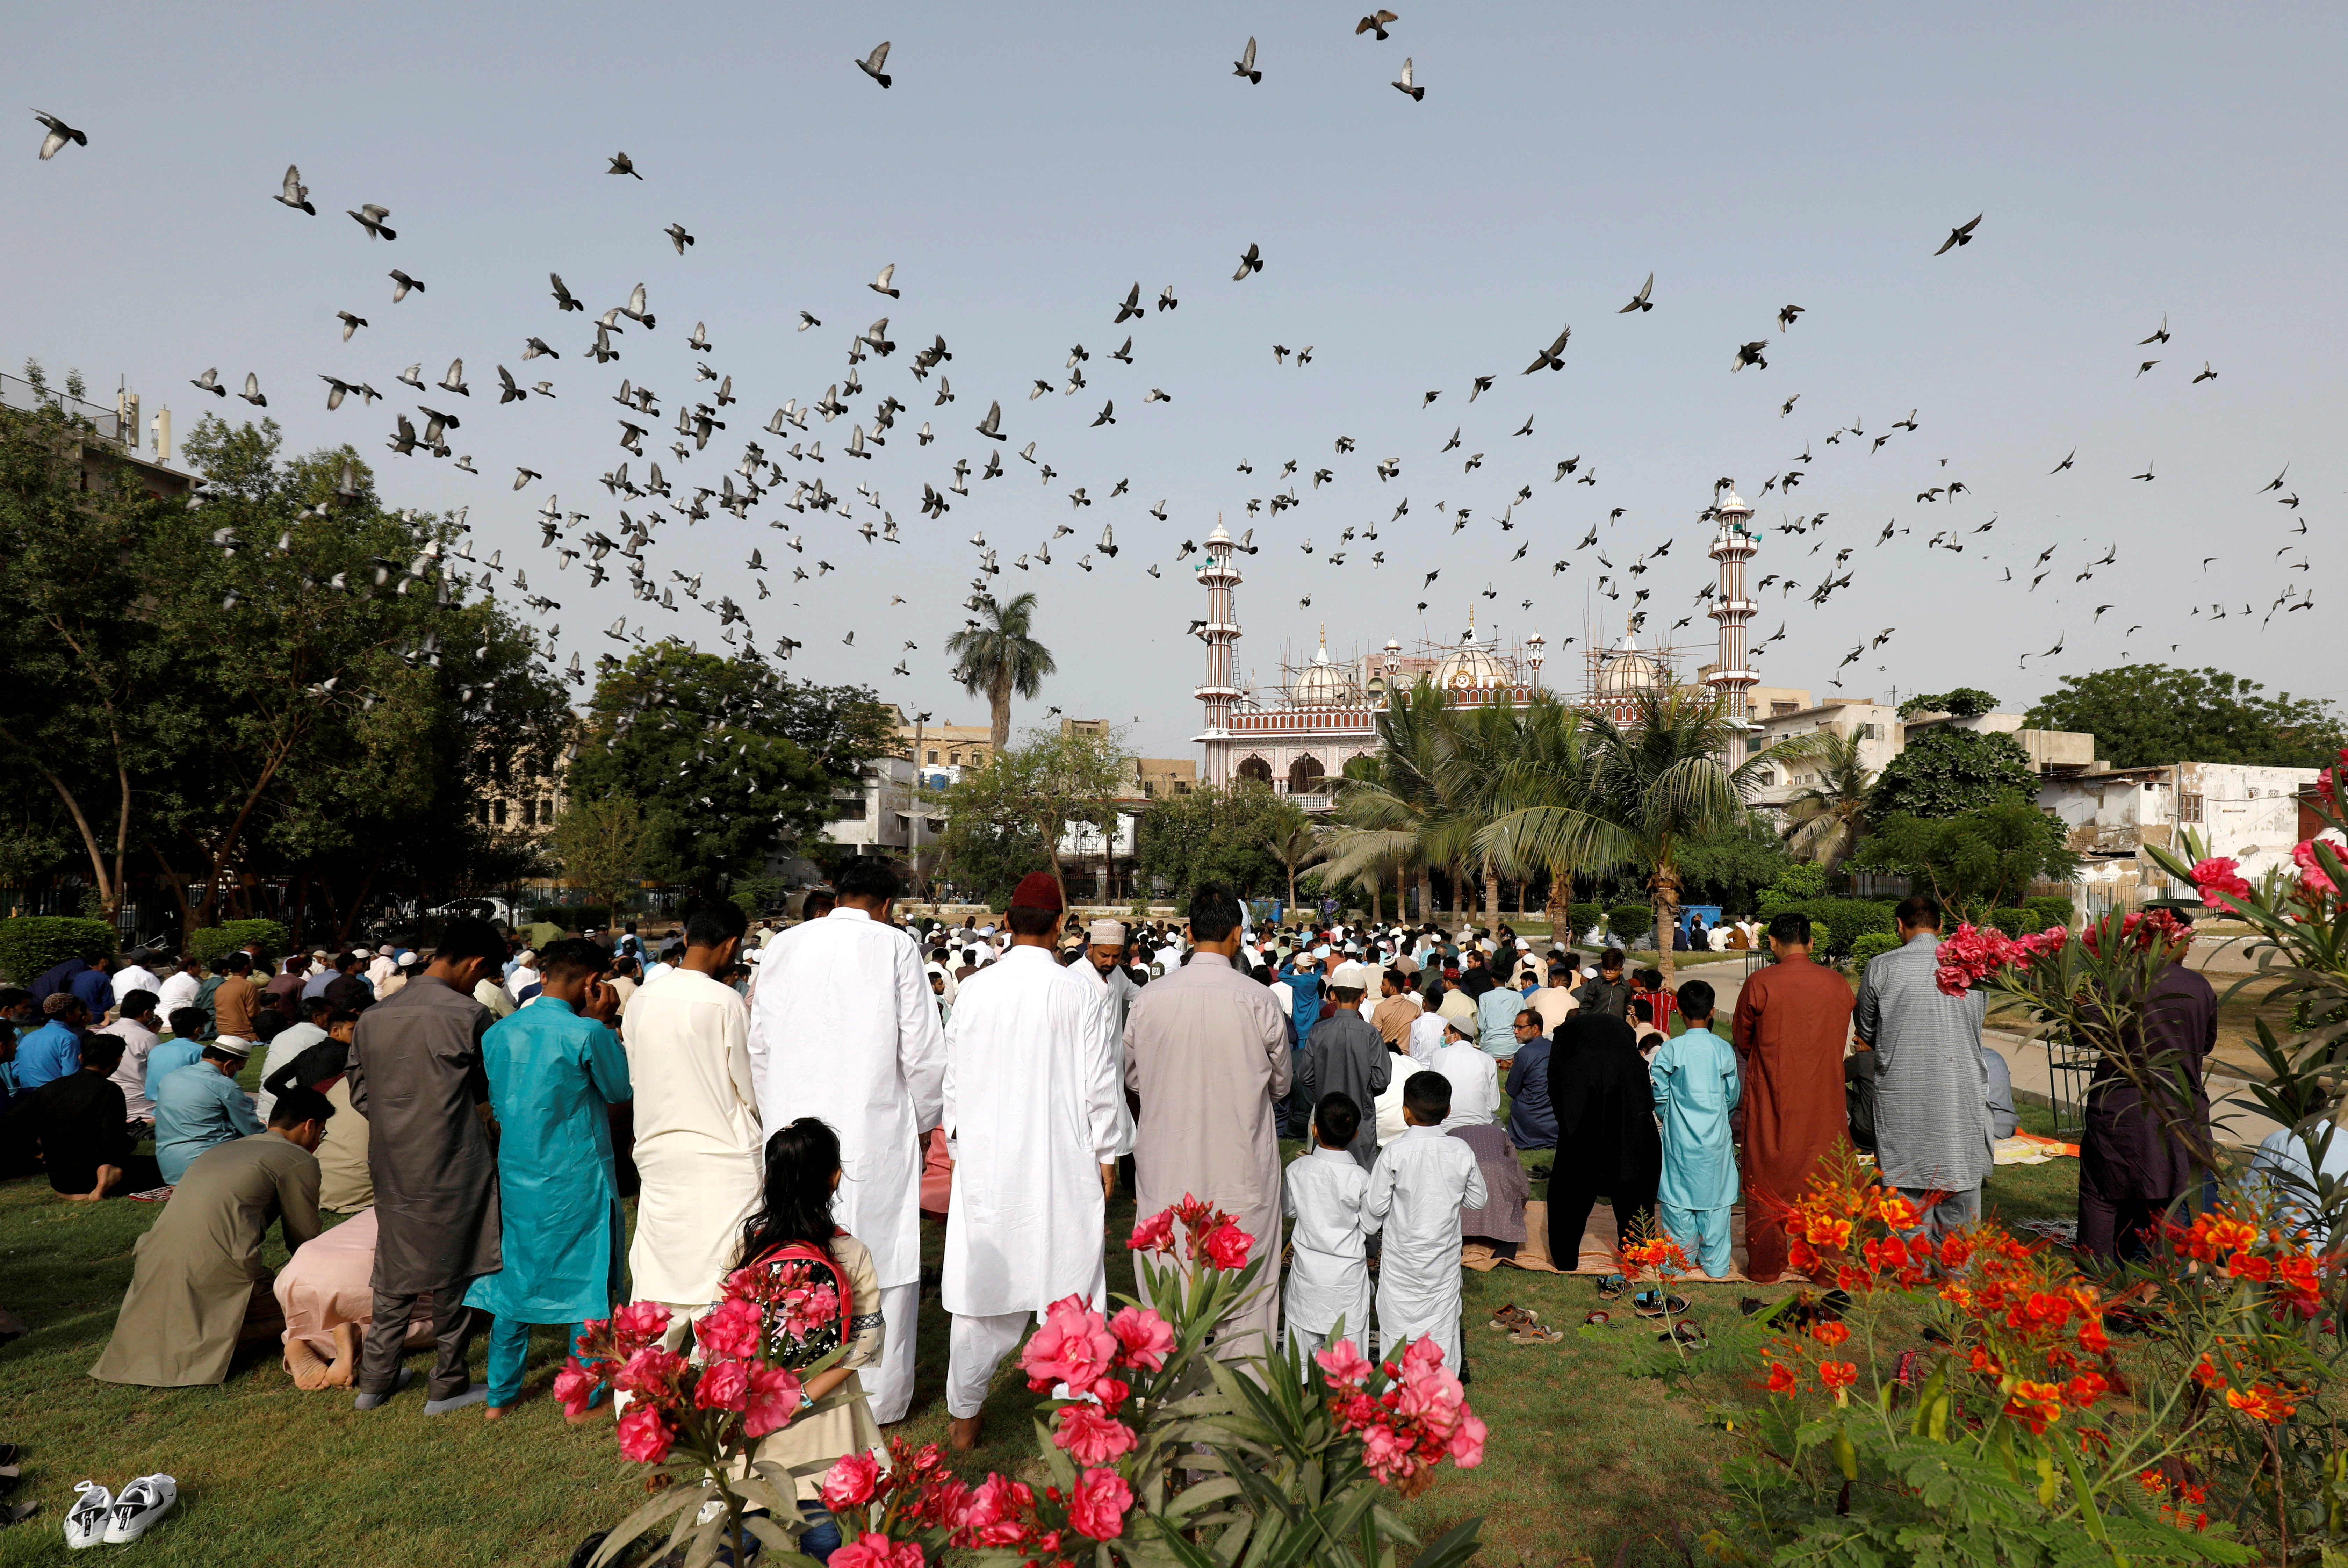 PM marks Eid, says Muslim generosity should be adapted amid COVID-19